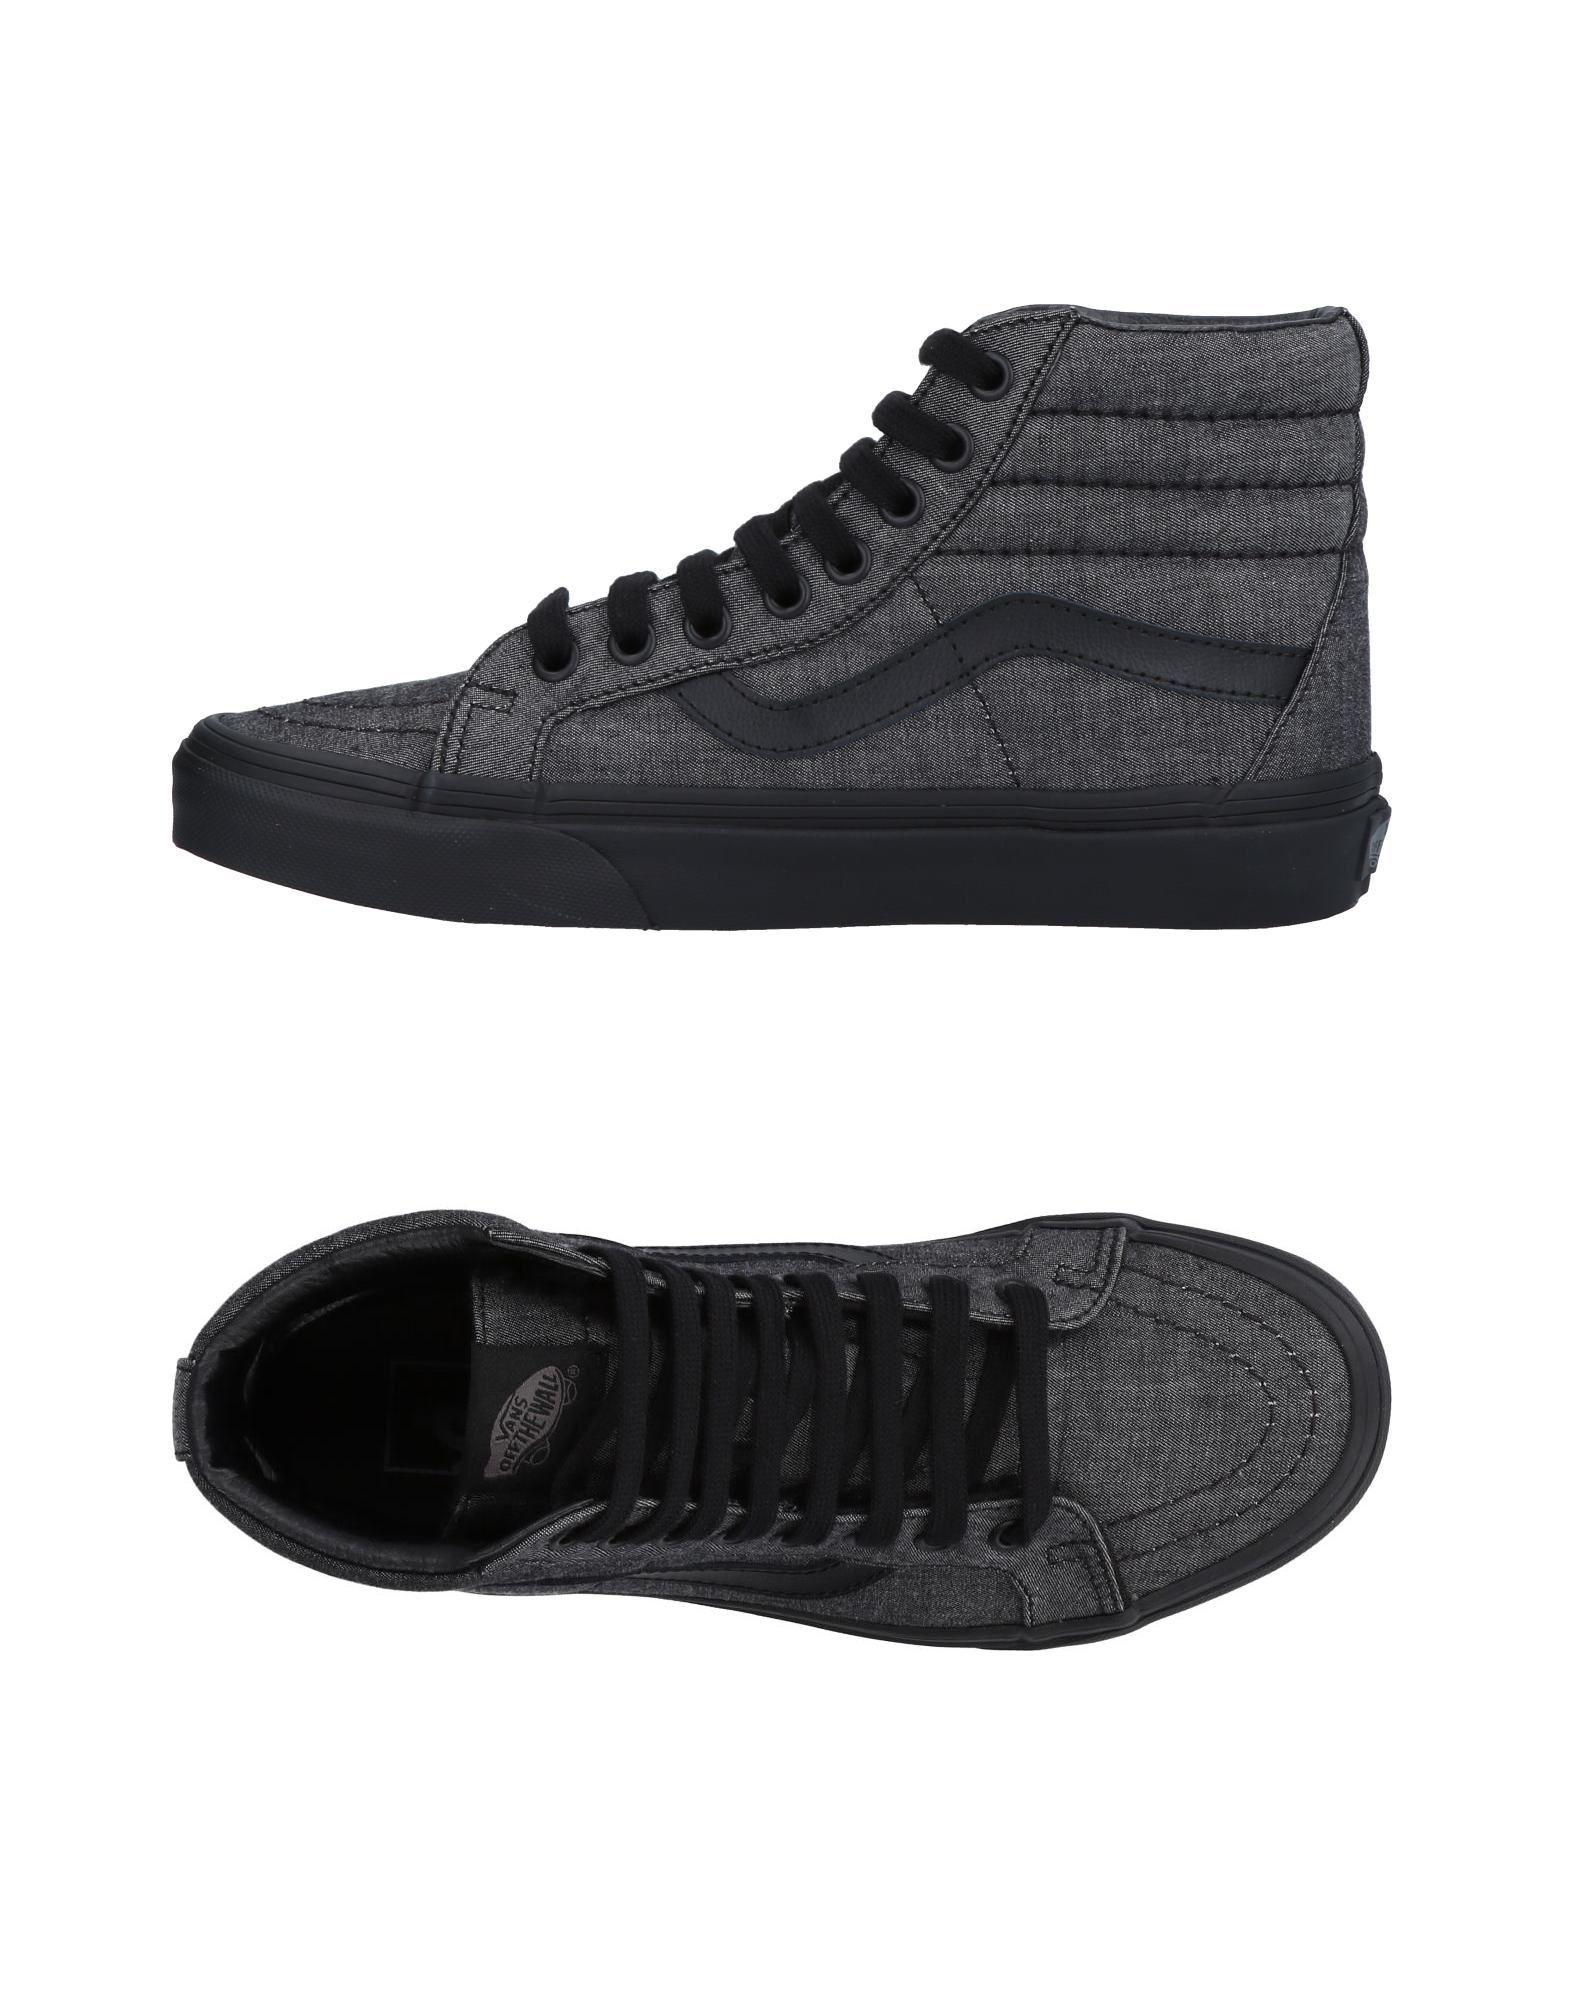 754313ece Scarpe da Vans Donna - 11493874CS Ginnastica nwkjgx2215-Sneakers ...